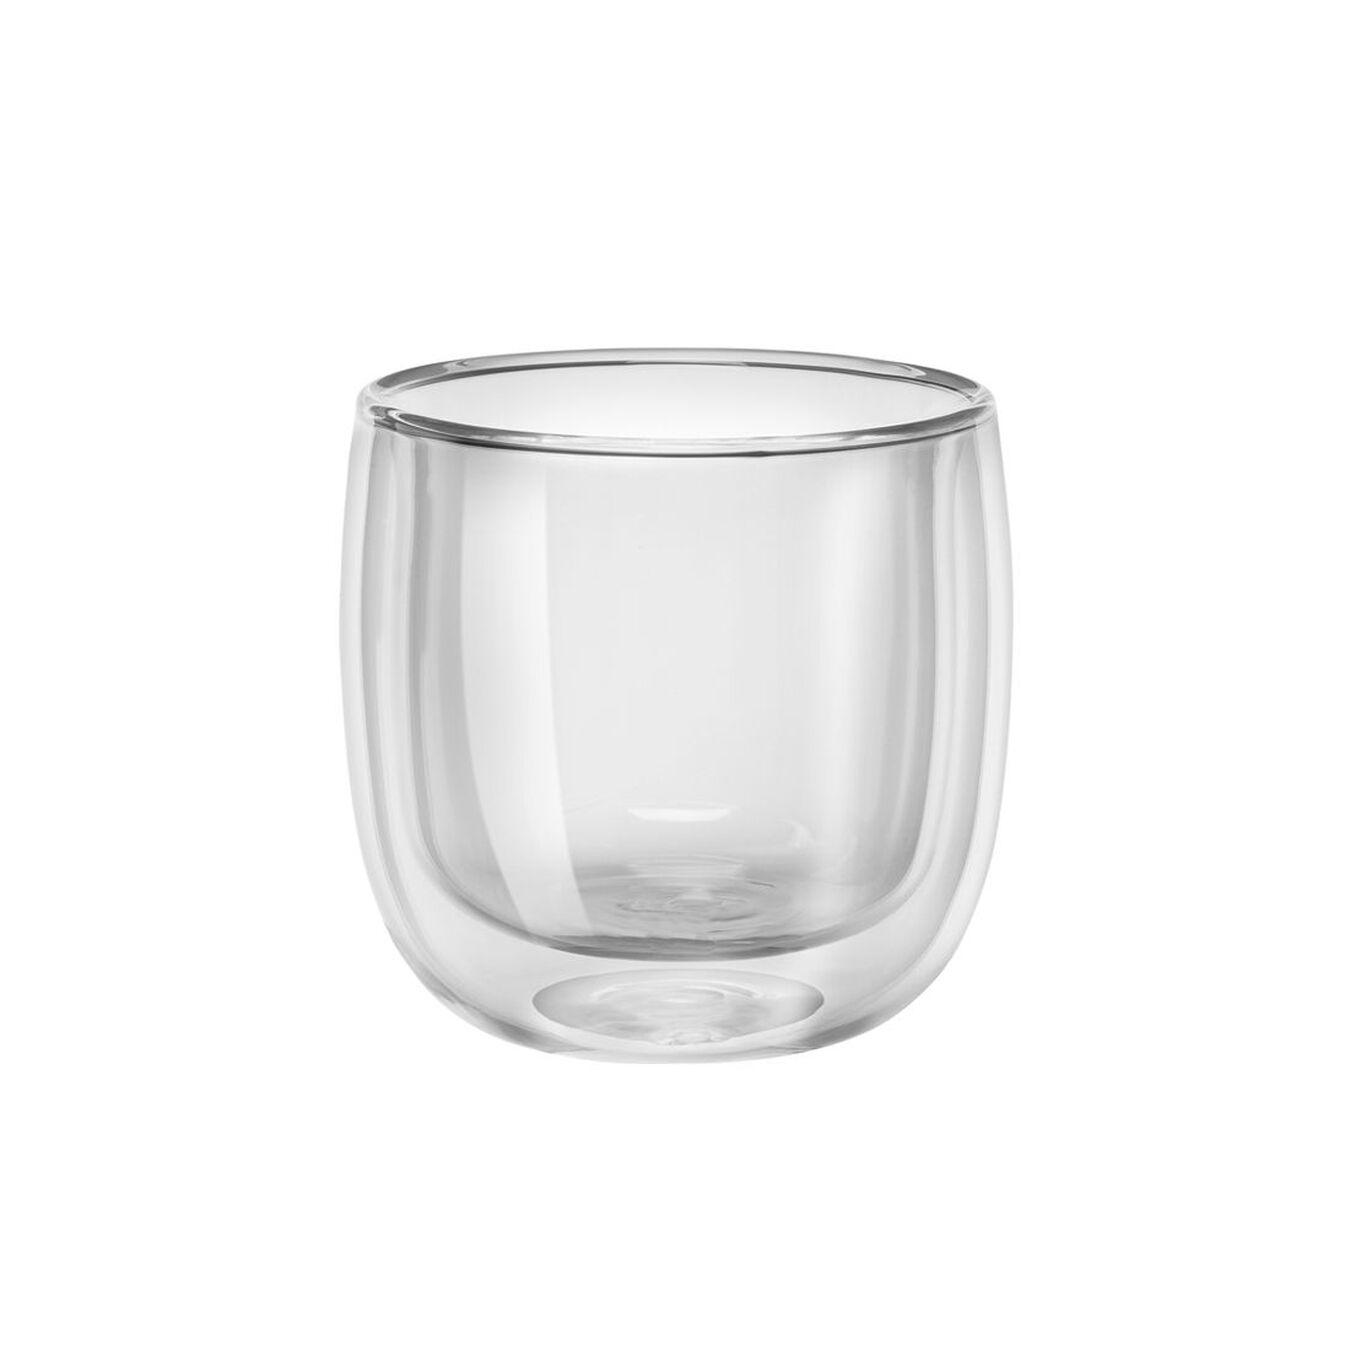 2-pc Tea glass set, Double wall ,,large 2